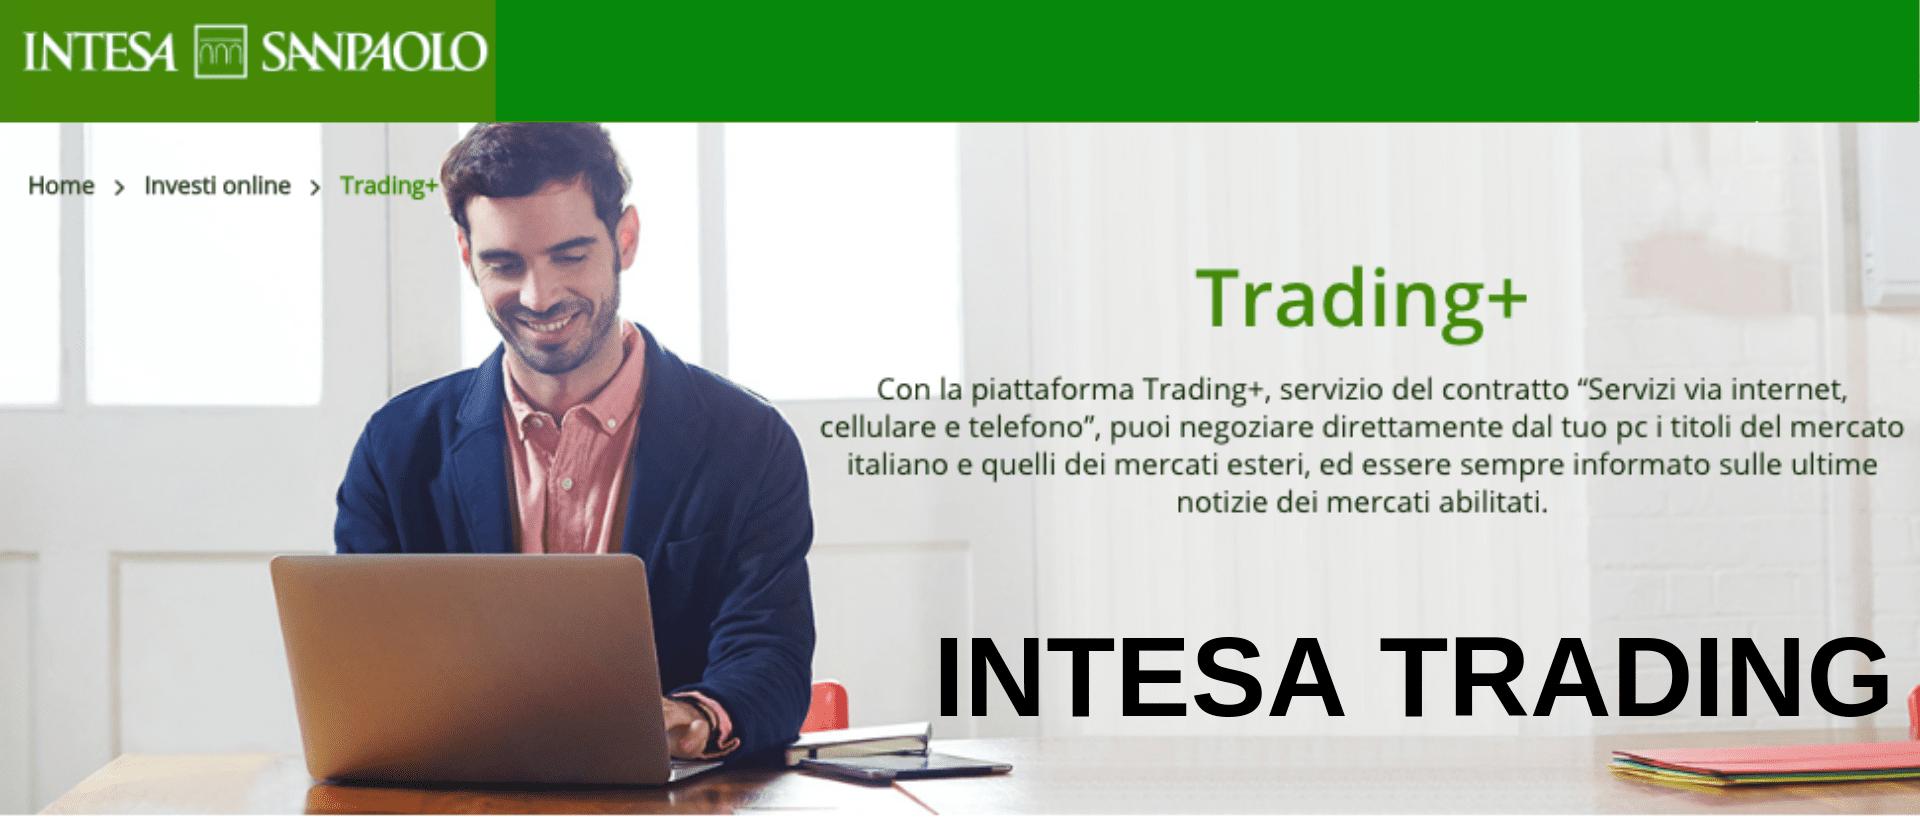 trading intesa)